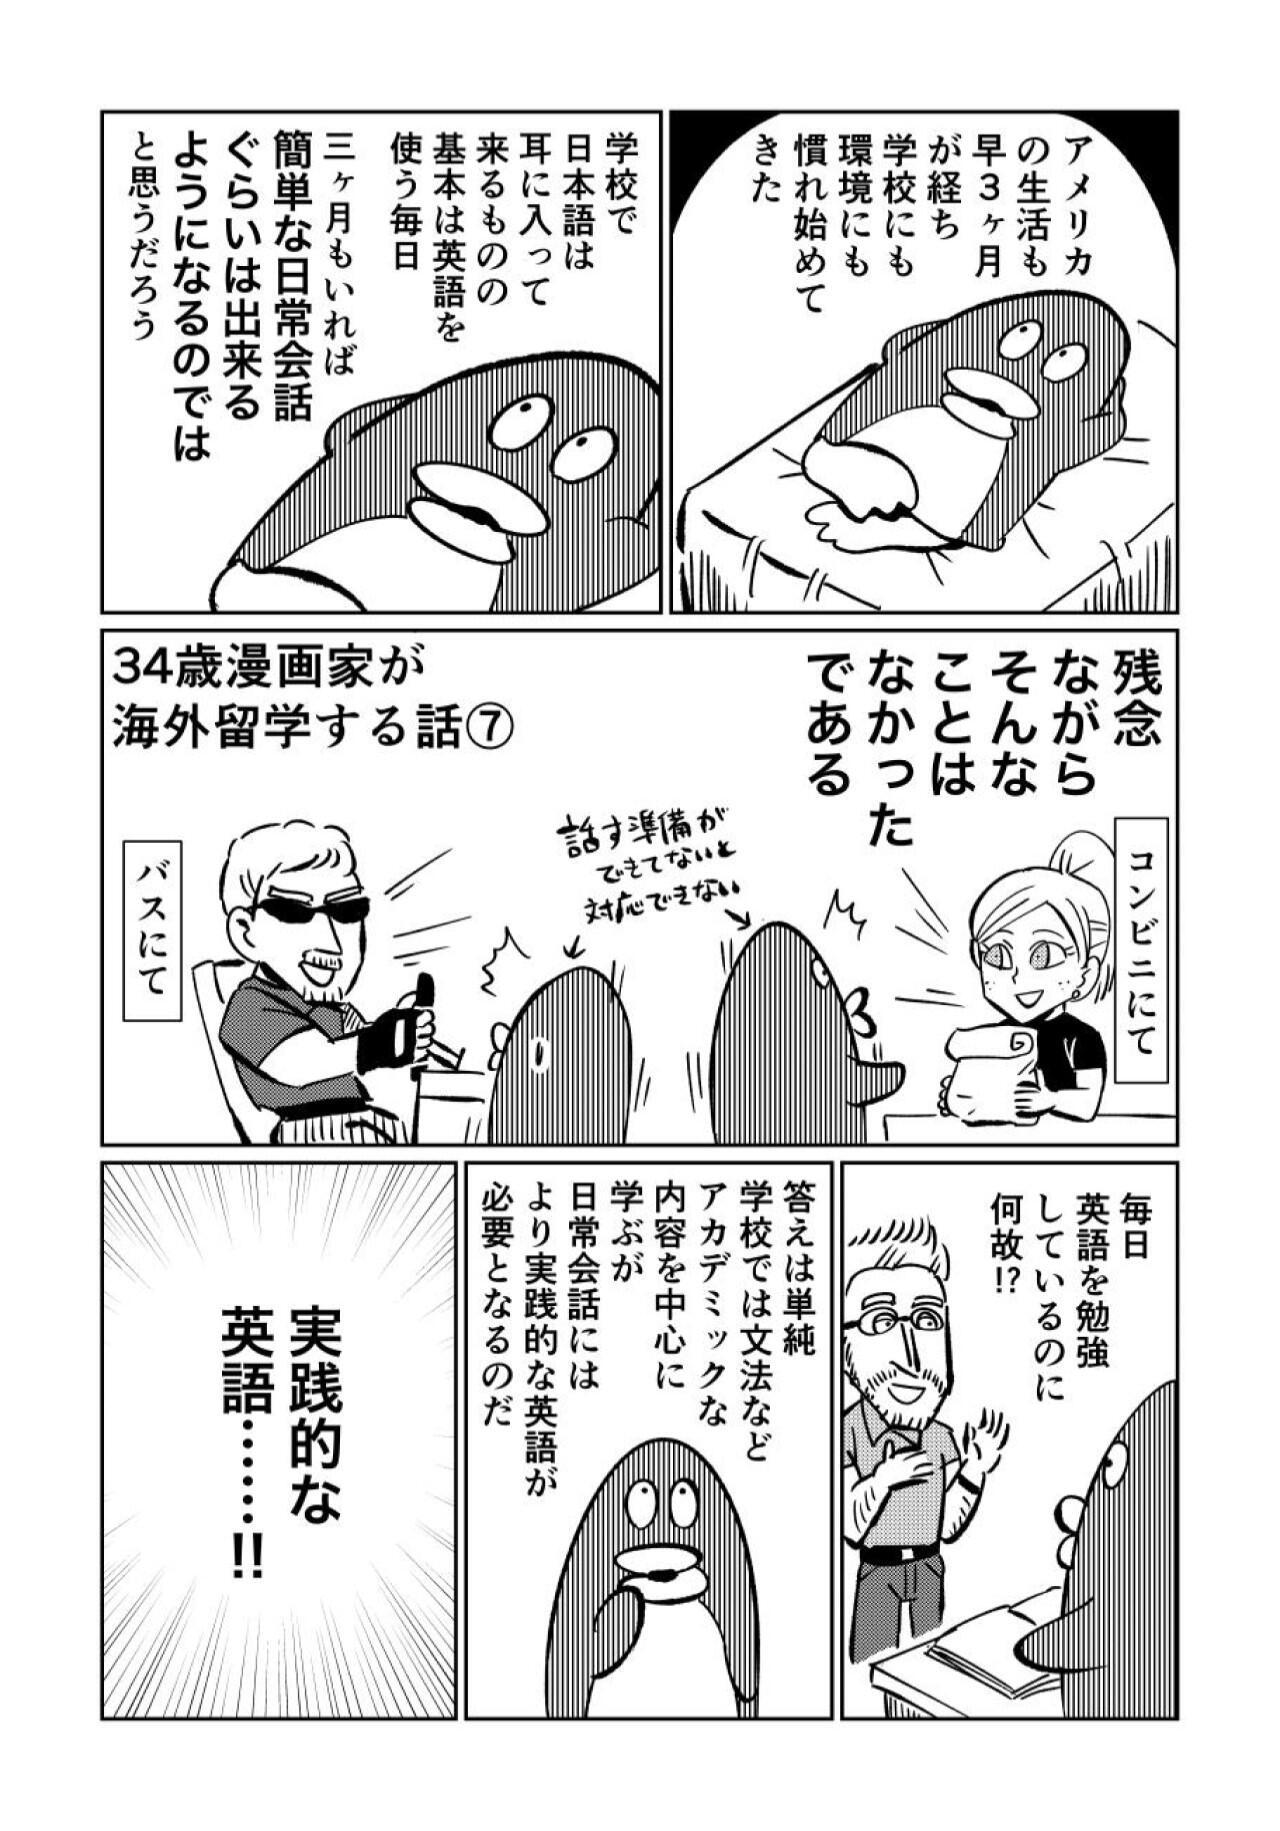 https://www.ryugaku.co.jp/column/images/34sai7_1_1280.jpg